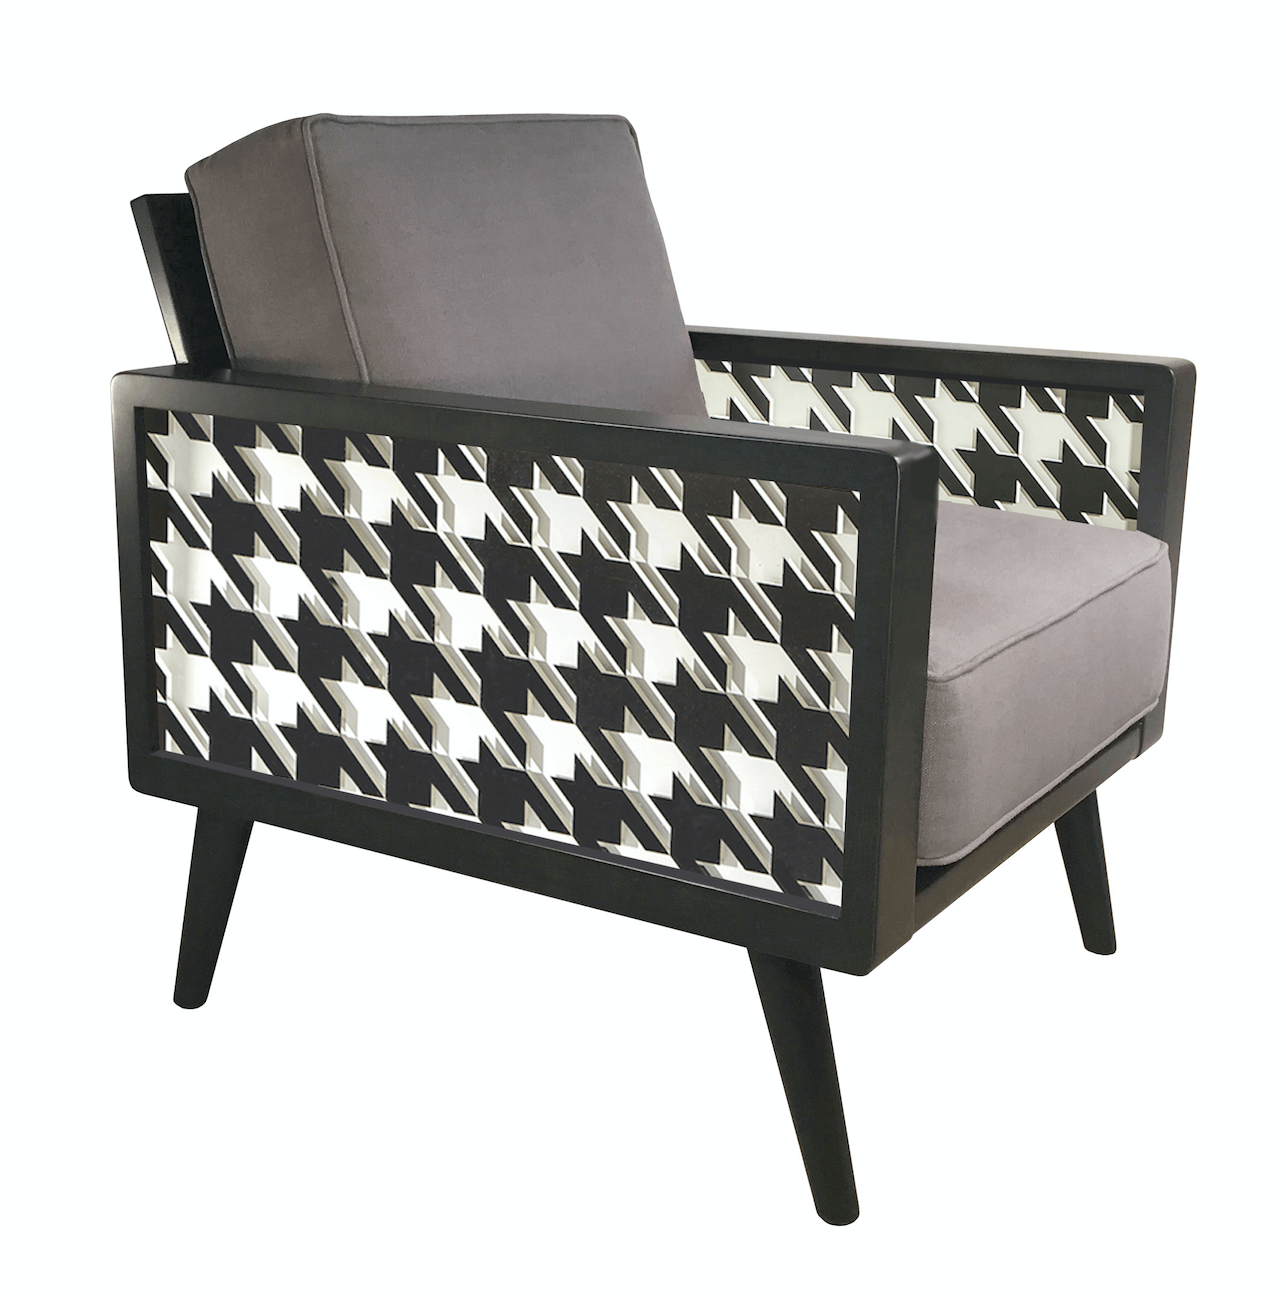 Enjoyable Houndstooth Mid Century Modern Lounge Chair1 Inzonedesignstudio Interior Chair Design Inzonedesignstudiocom